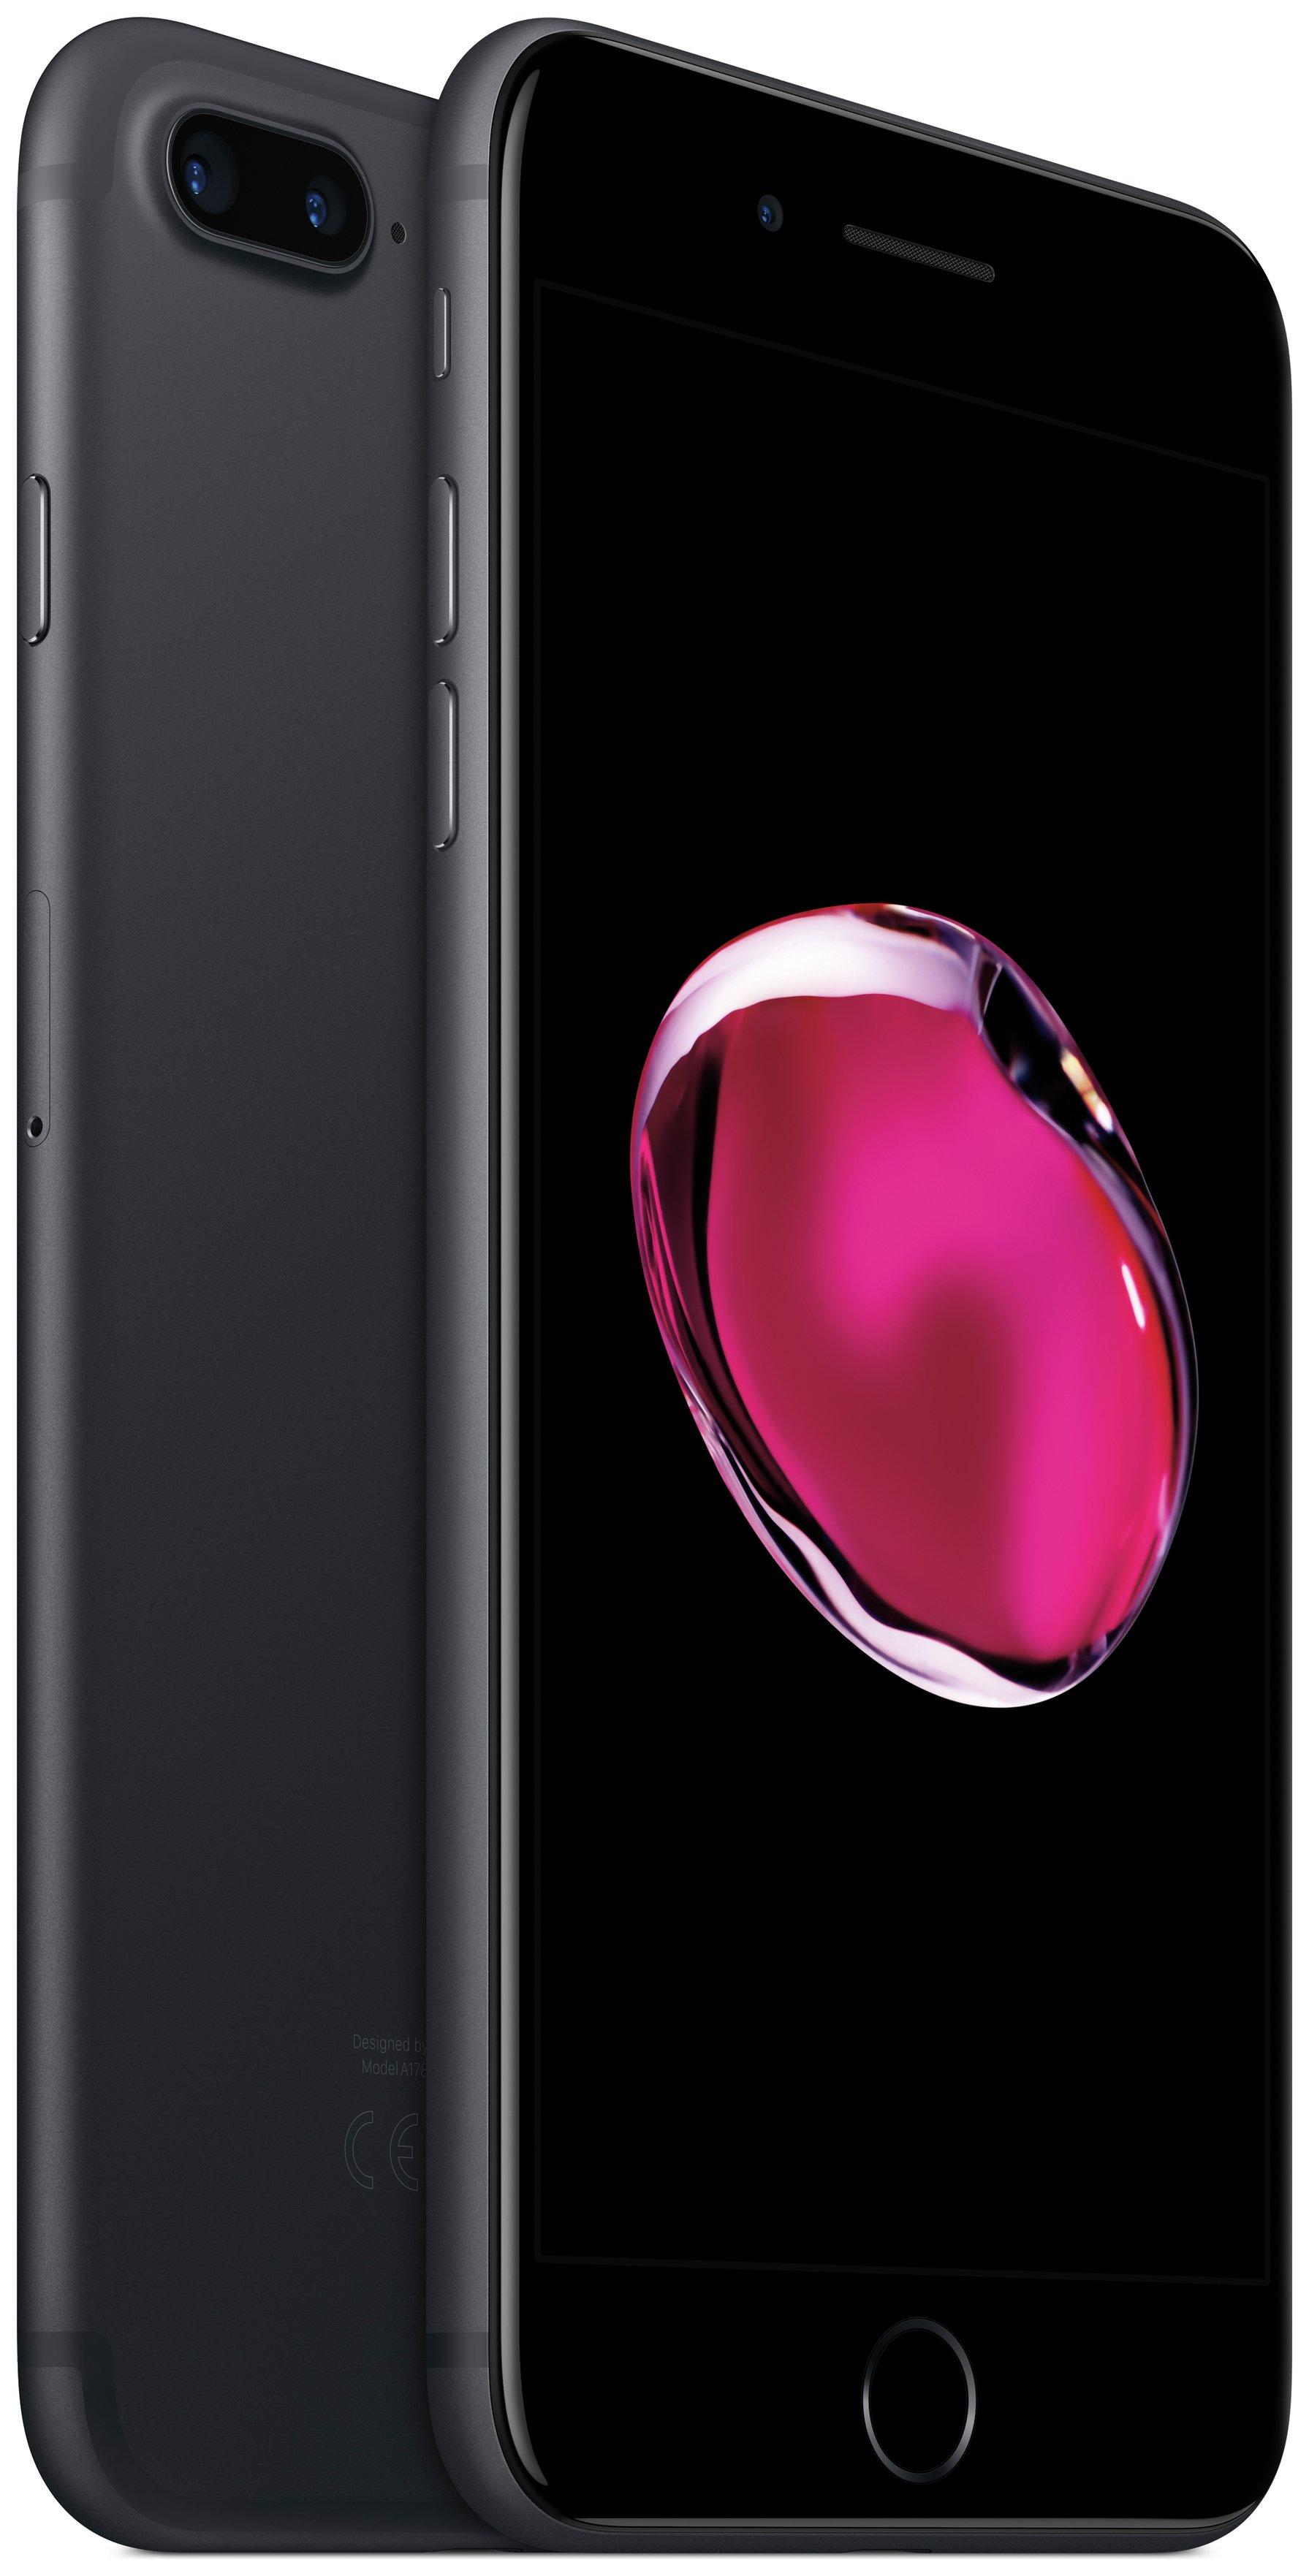 Sim Free iPhone 7 Plus 256GB Mobile Phone - Black.